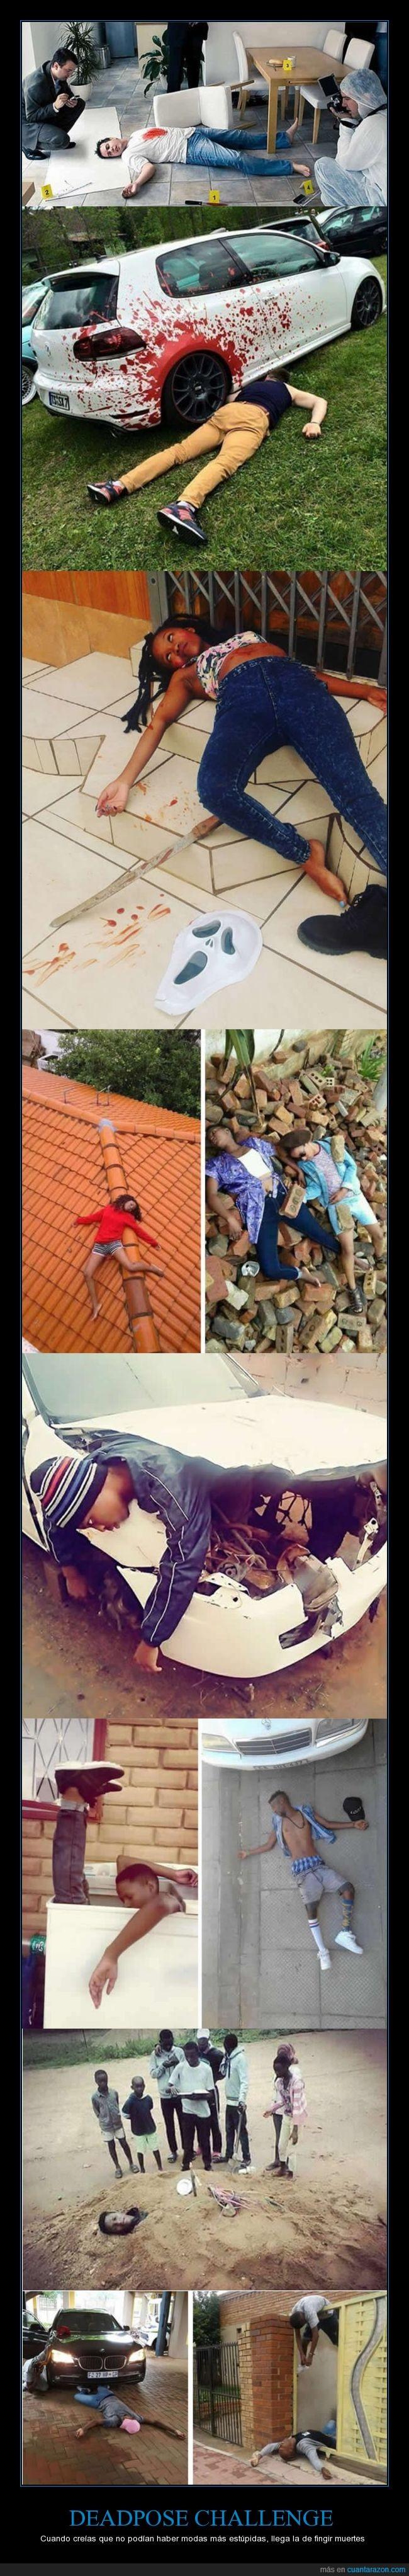 challenge,dead pose,moda,viral